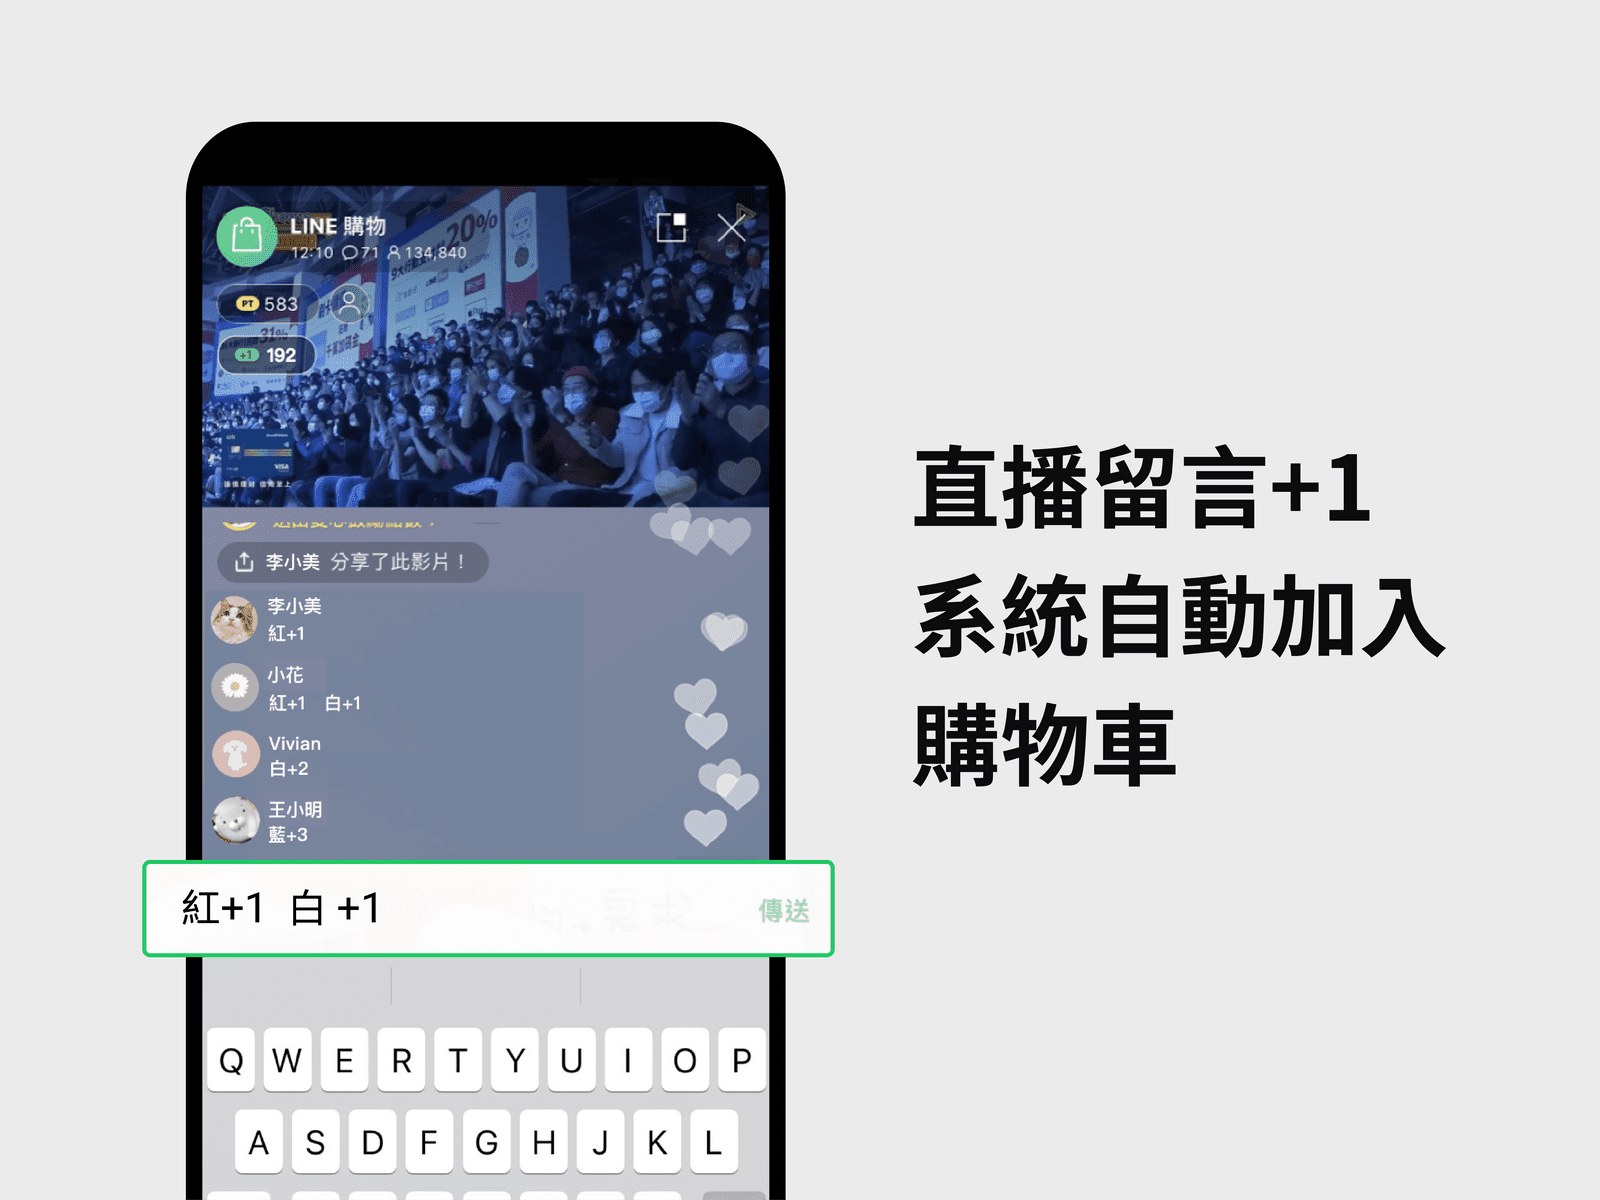 LINE購物直播支援留言購買+1功能